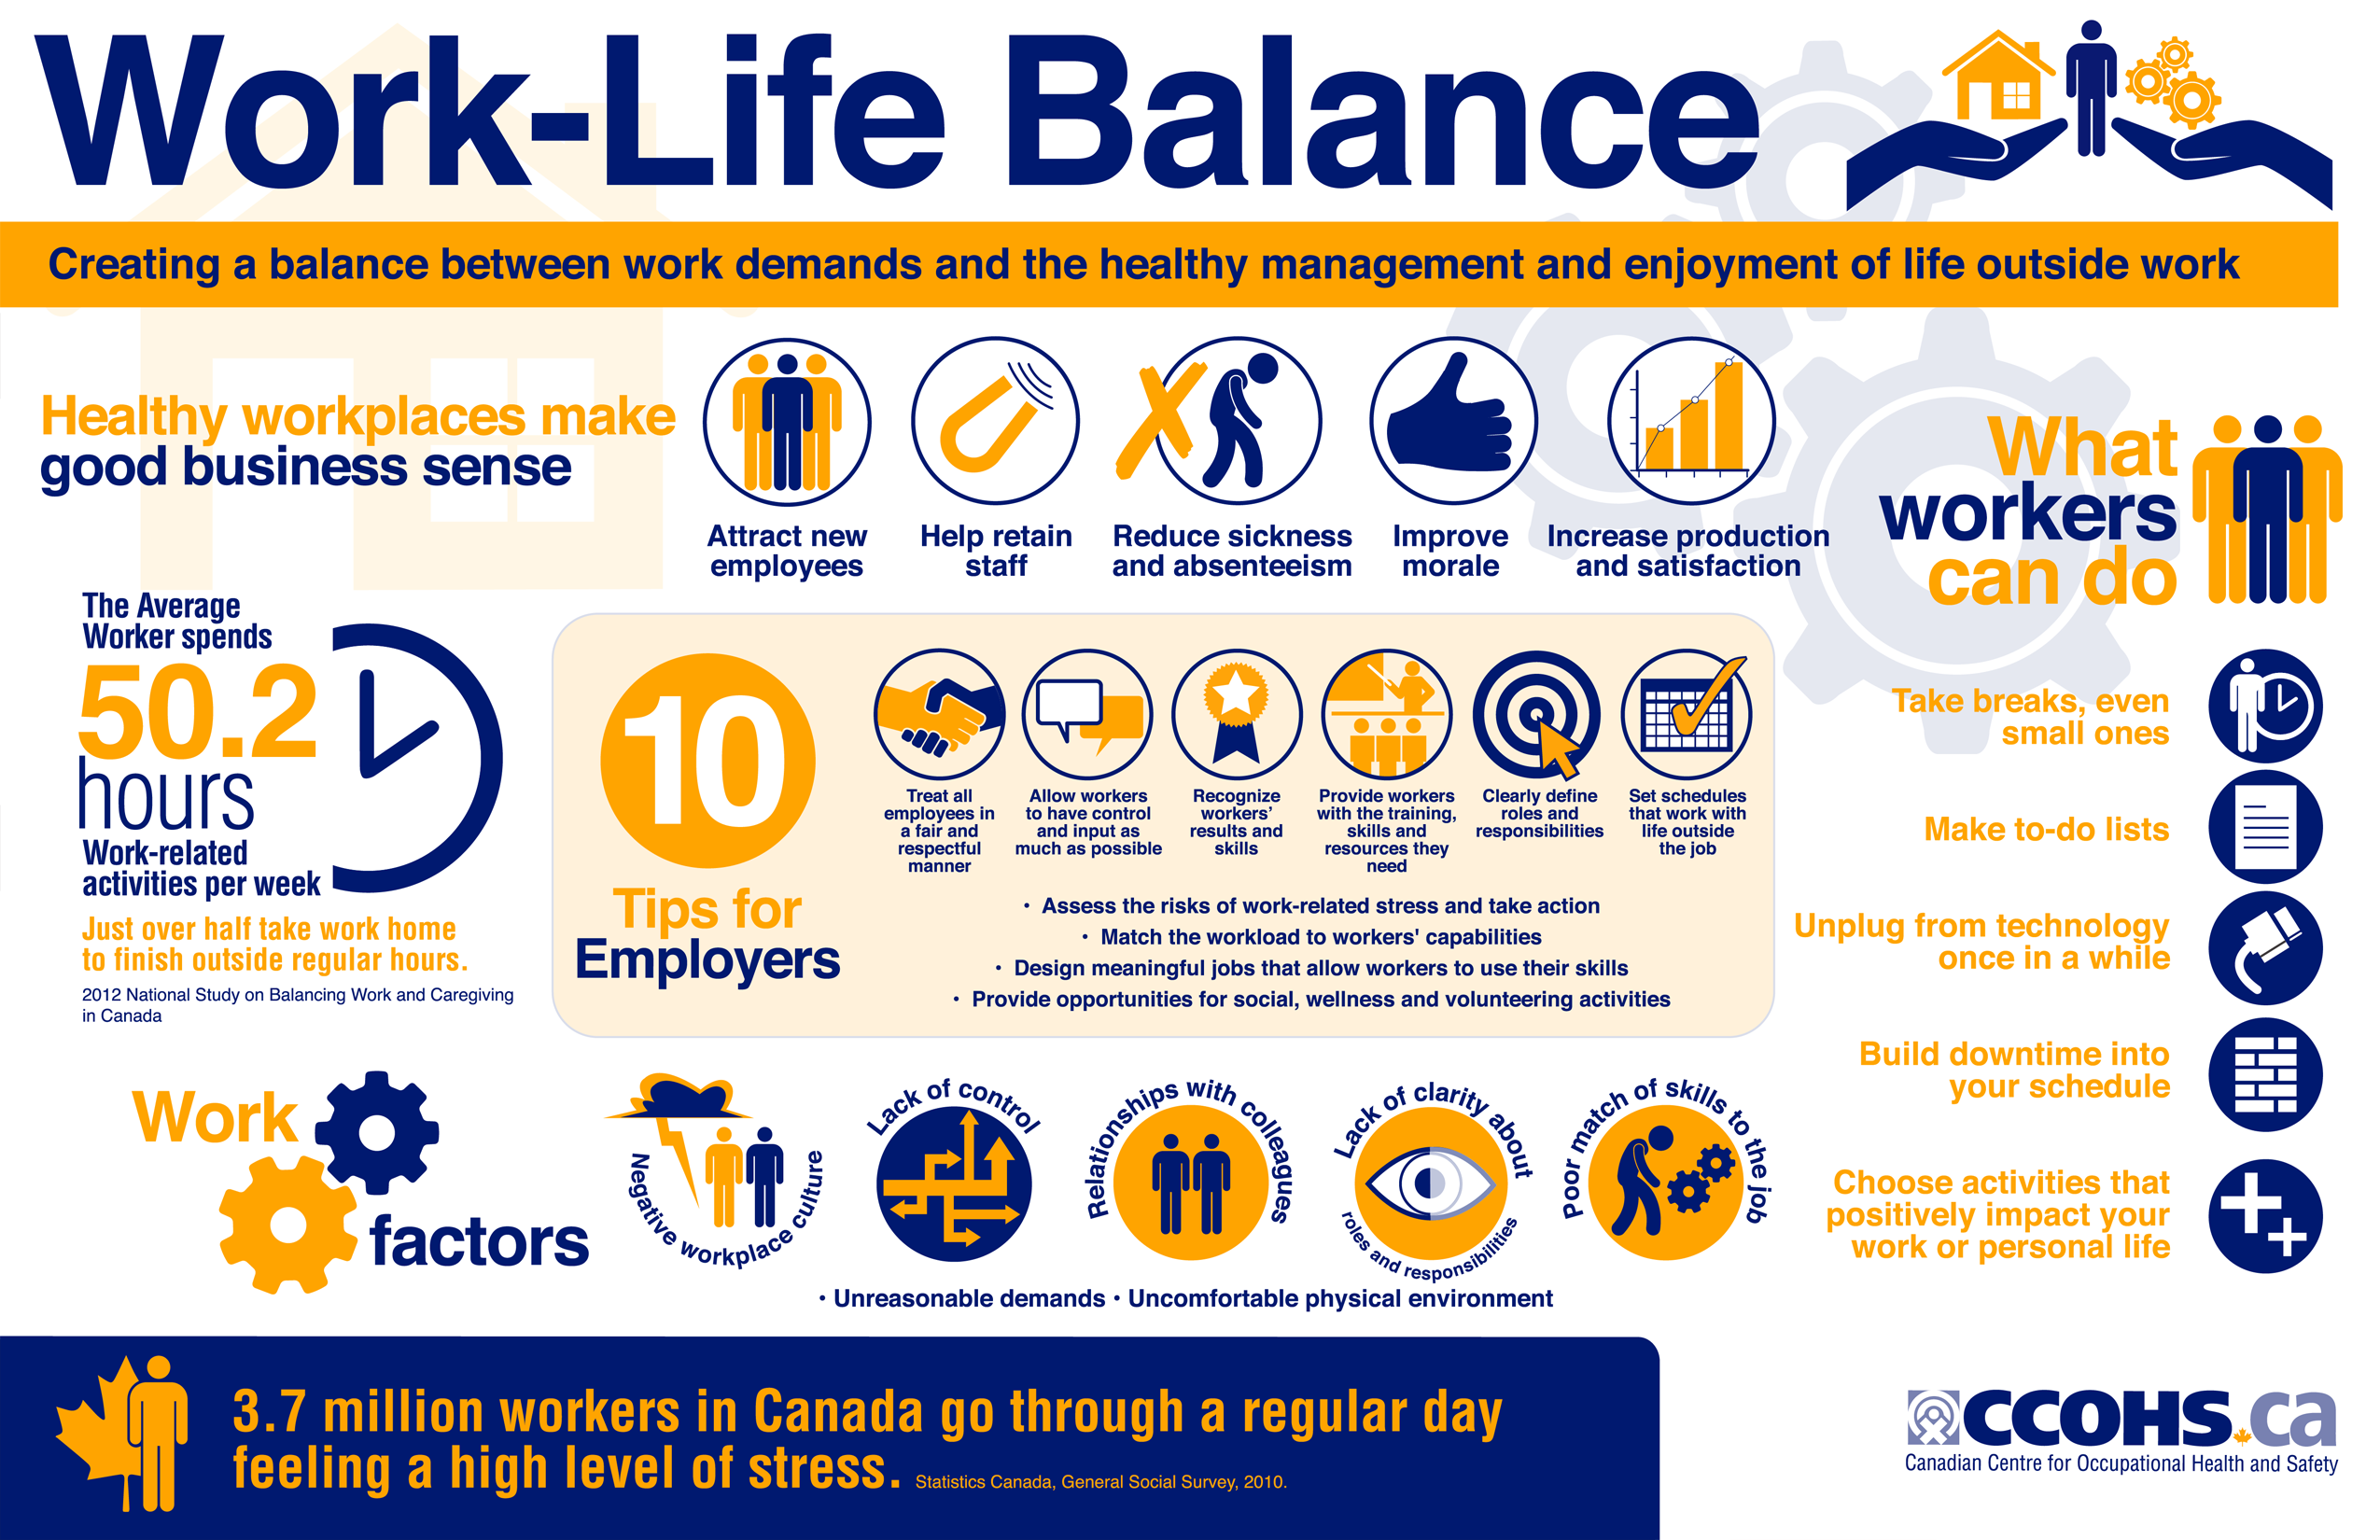 Share this infographic explaining why worklife balance